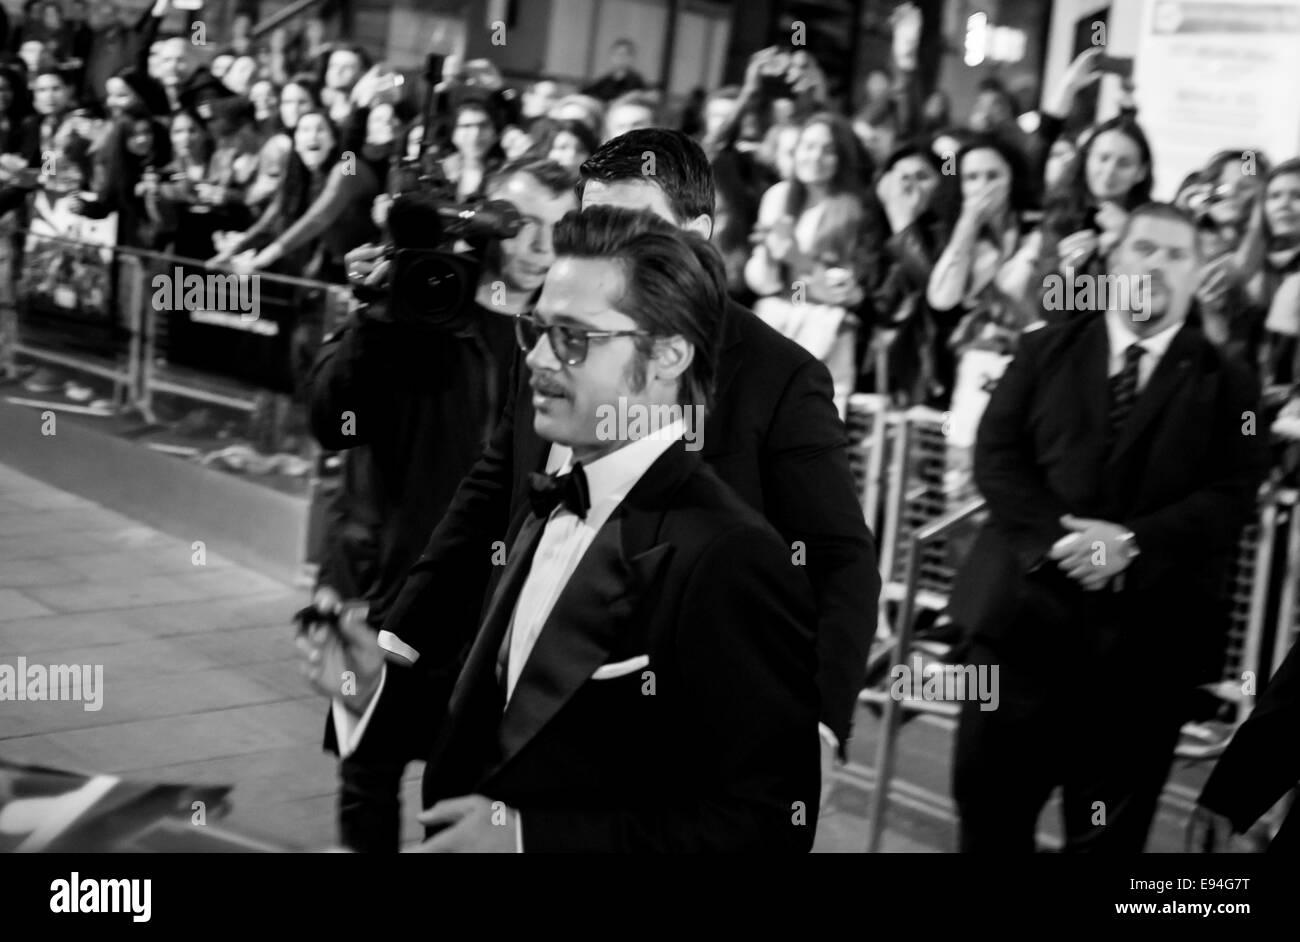 Brad Pitt in London film premiere Fury. - Stock Image